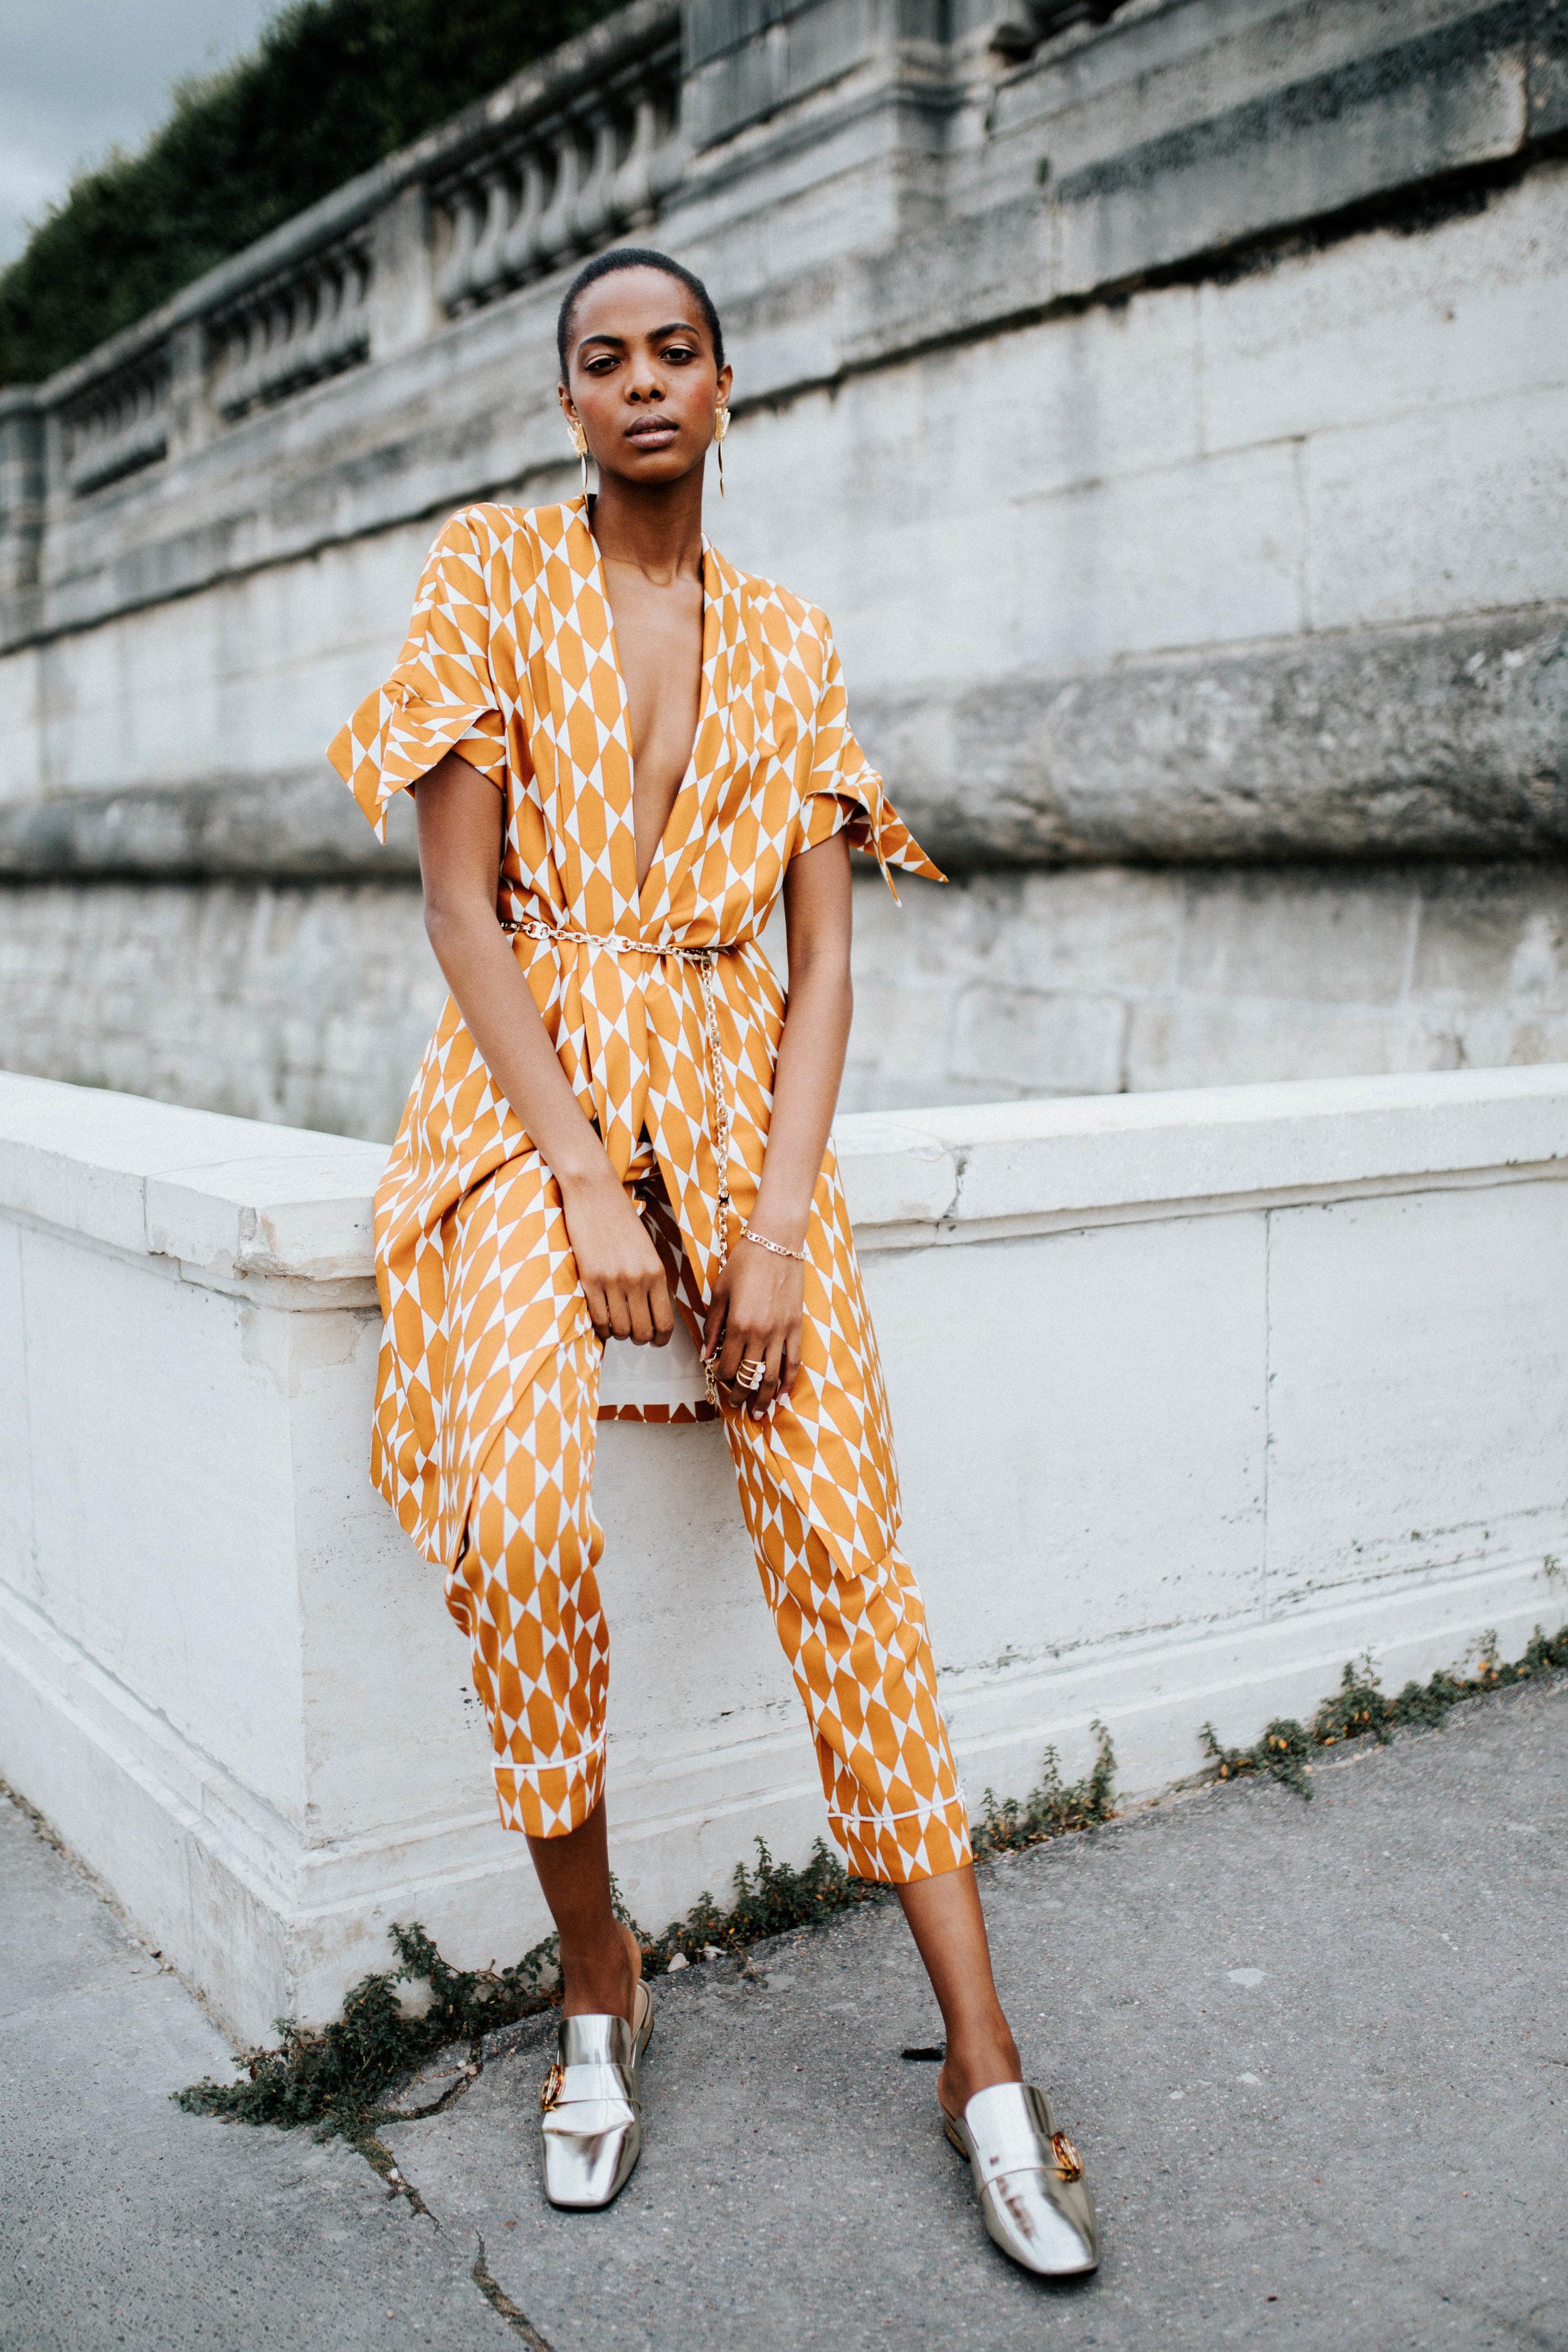 Atasia Malick Dia - Atasia's Look #6: Haley Coat, Devi Pant, Dragonfly Earrings, Sidney Backless Loafers